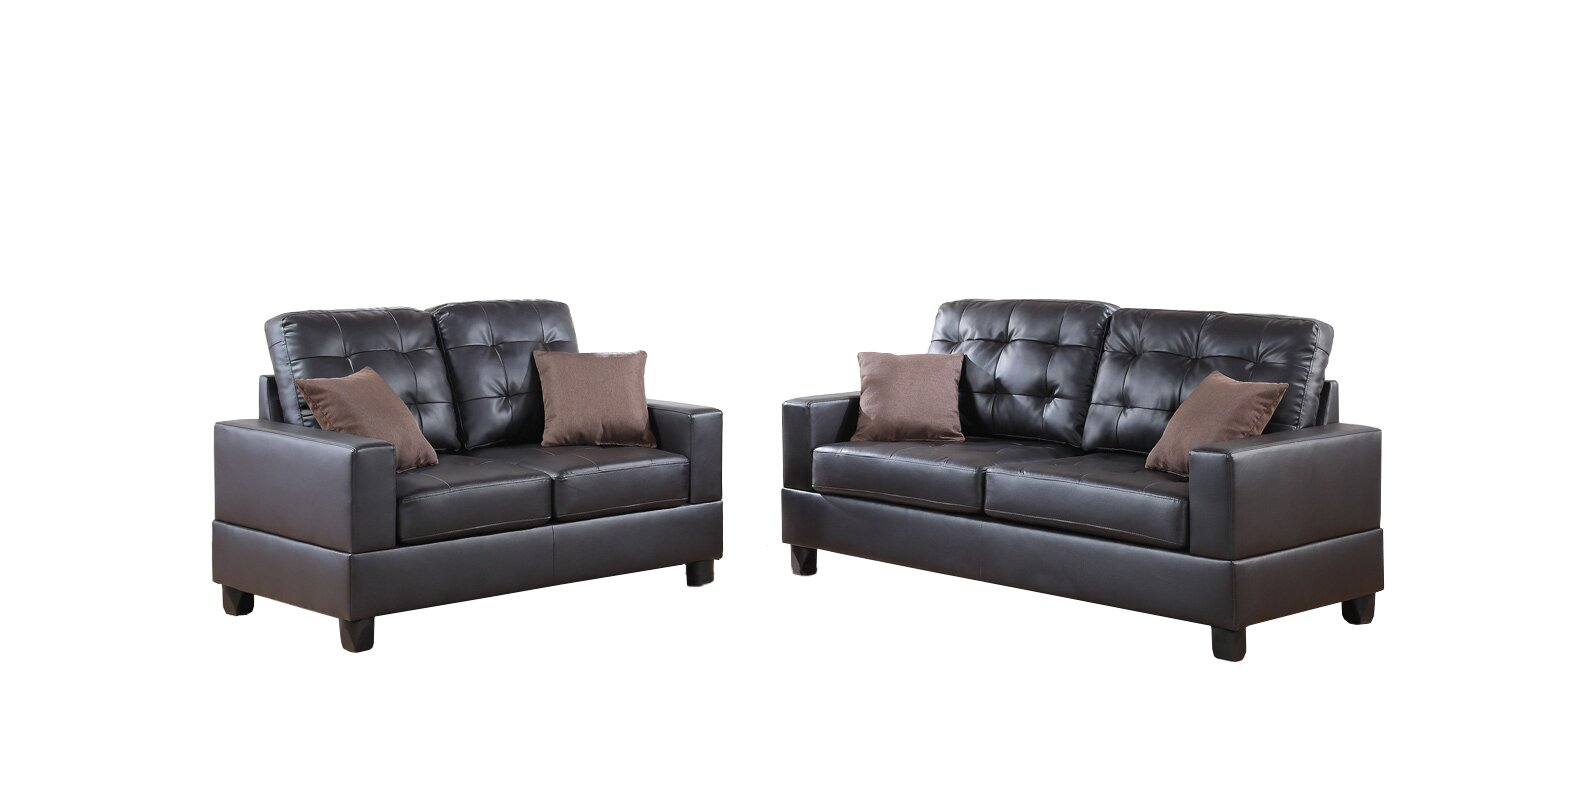 Cheyne 2 Piece Living Room Set